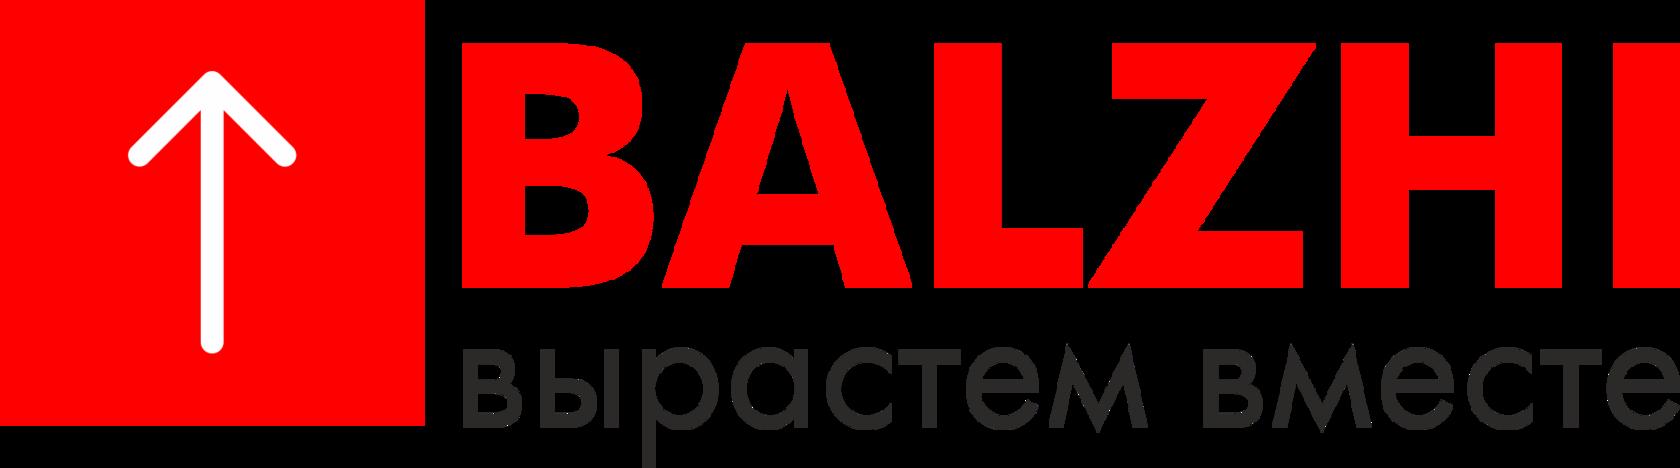 BALZHI INTERNET AGENCY